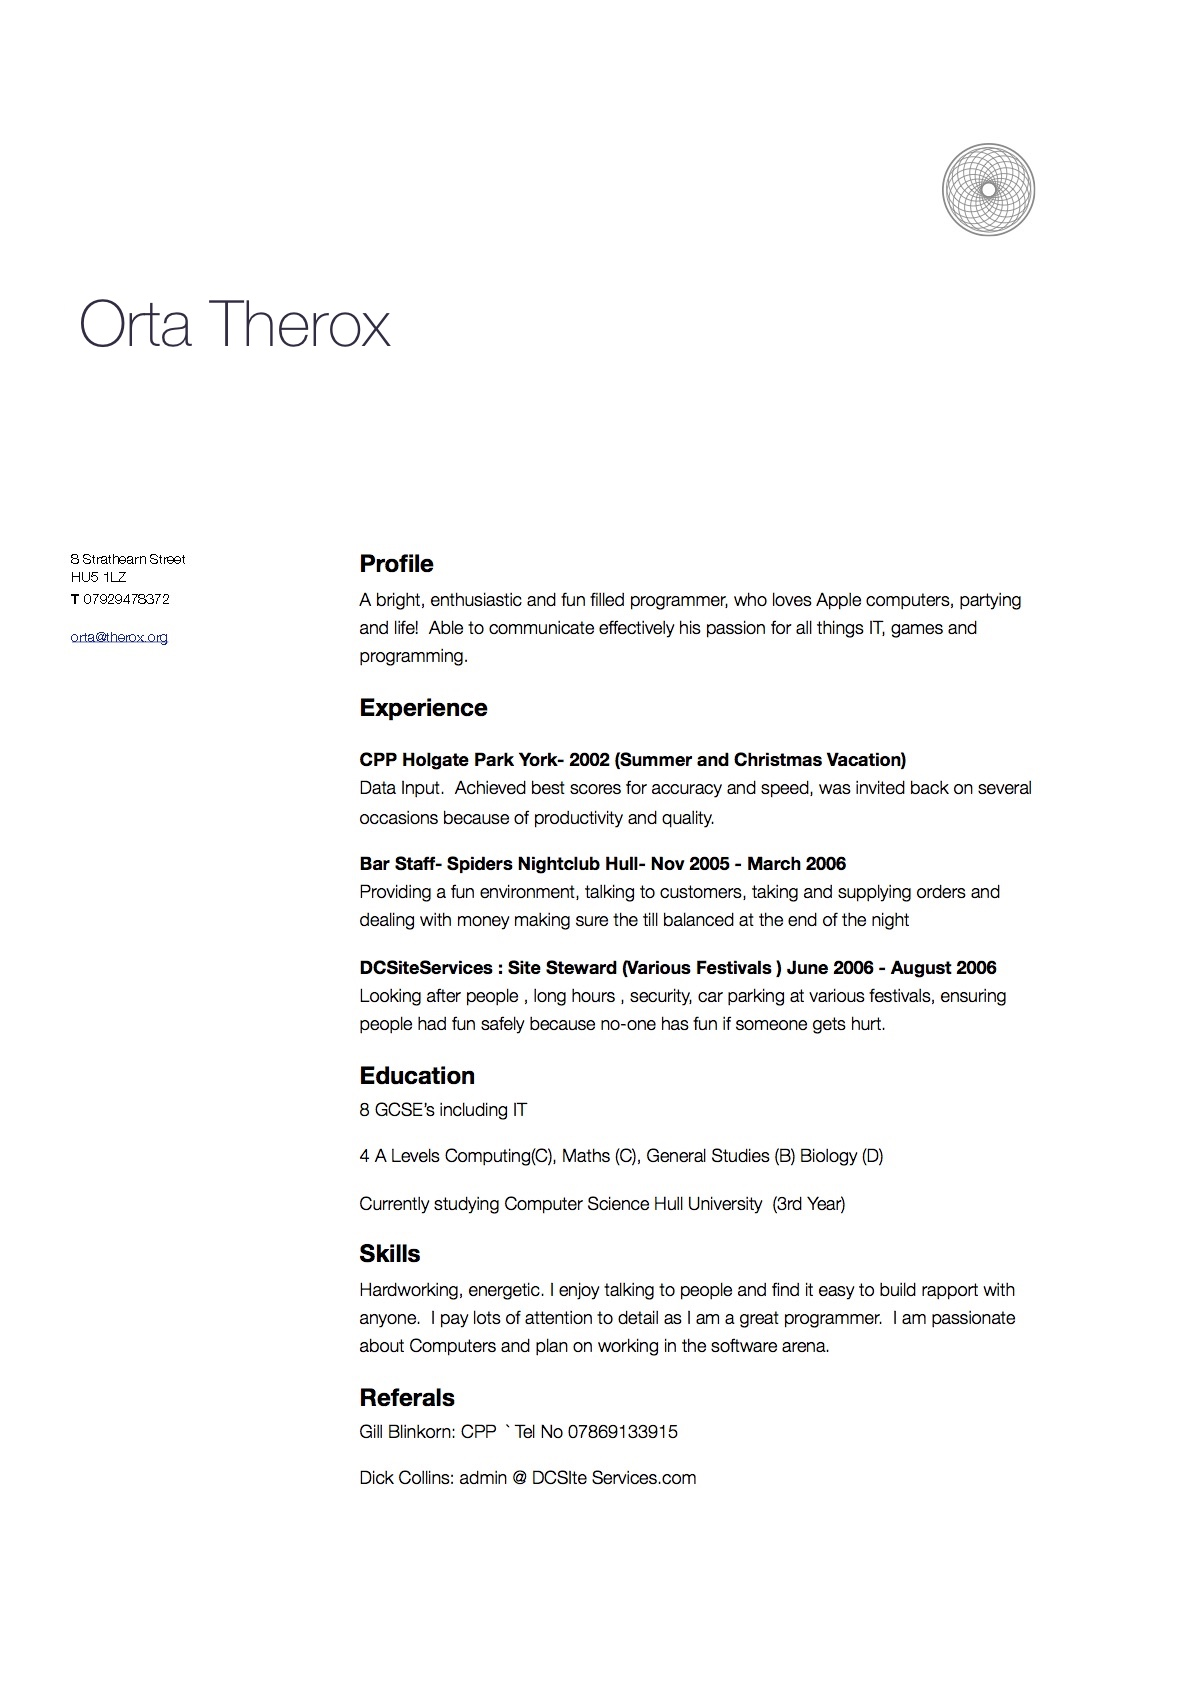 Awesome Resume Builder Github Ideas - Wordpress Themes Ideas ...